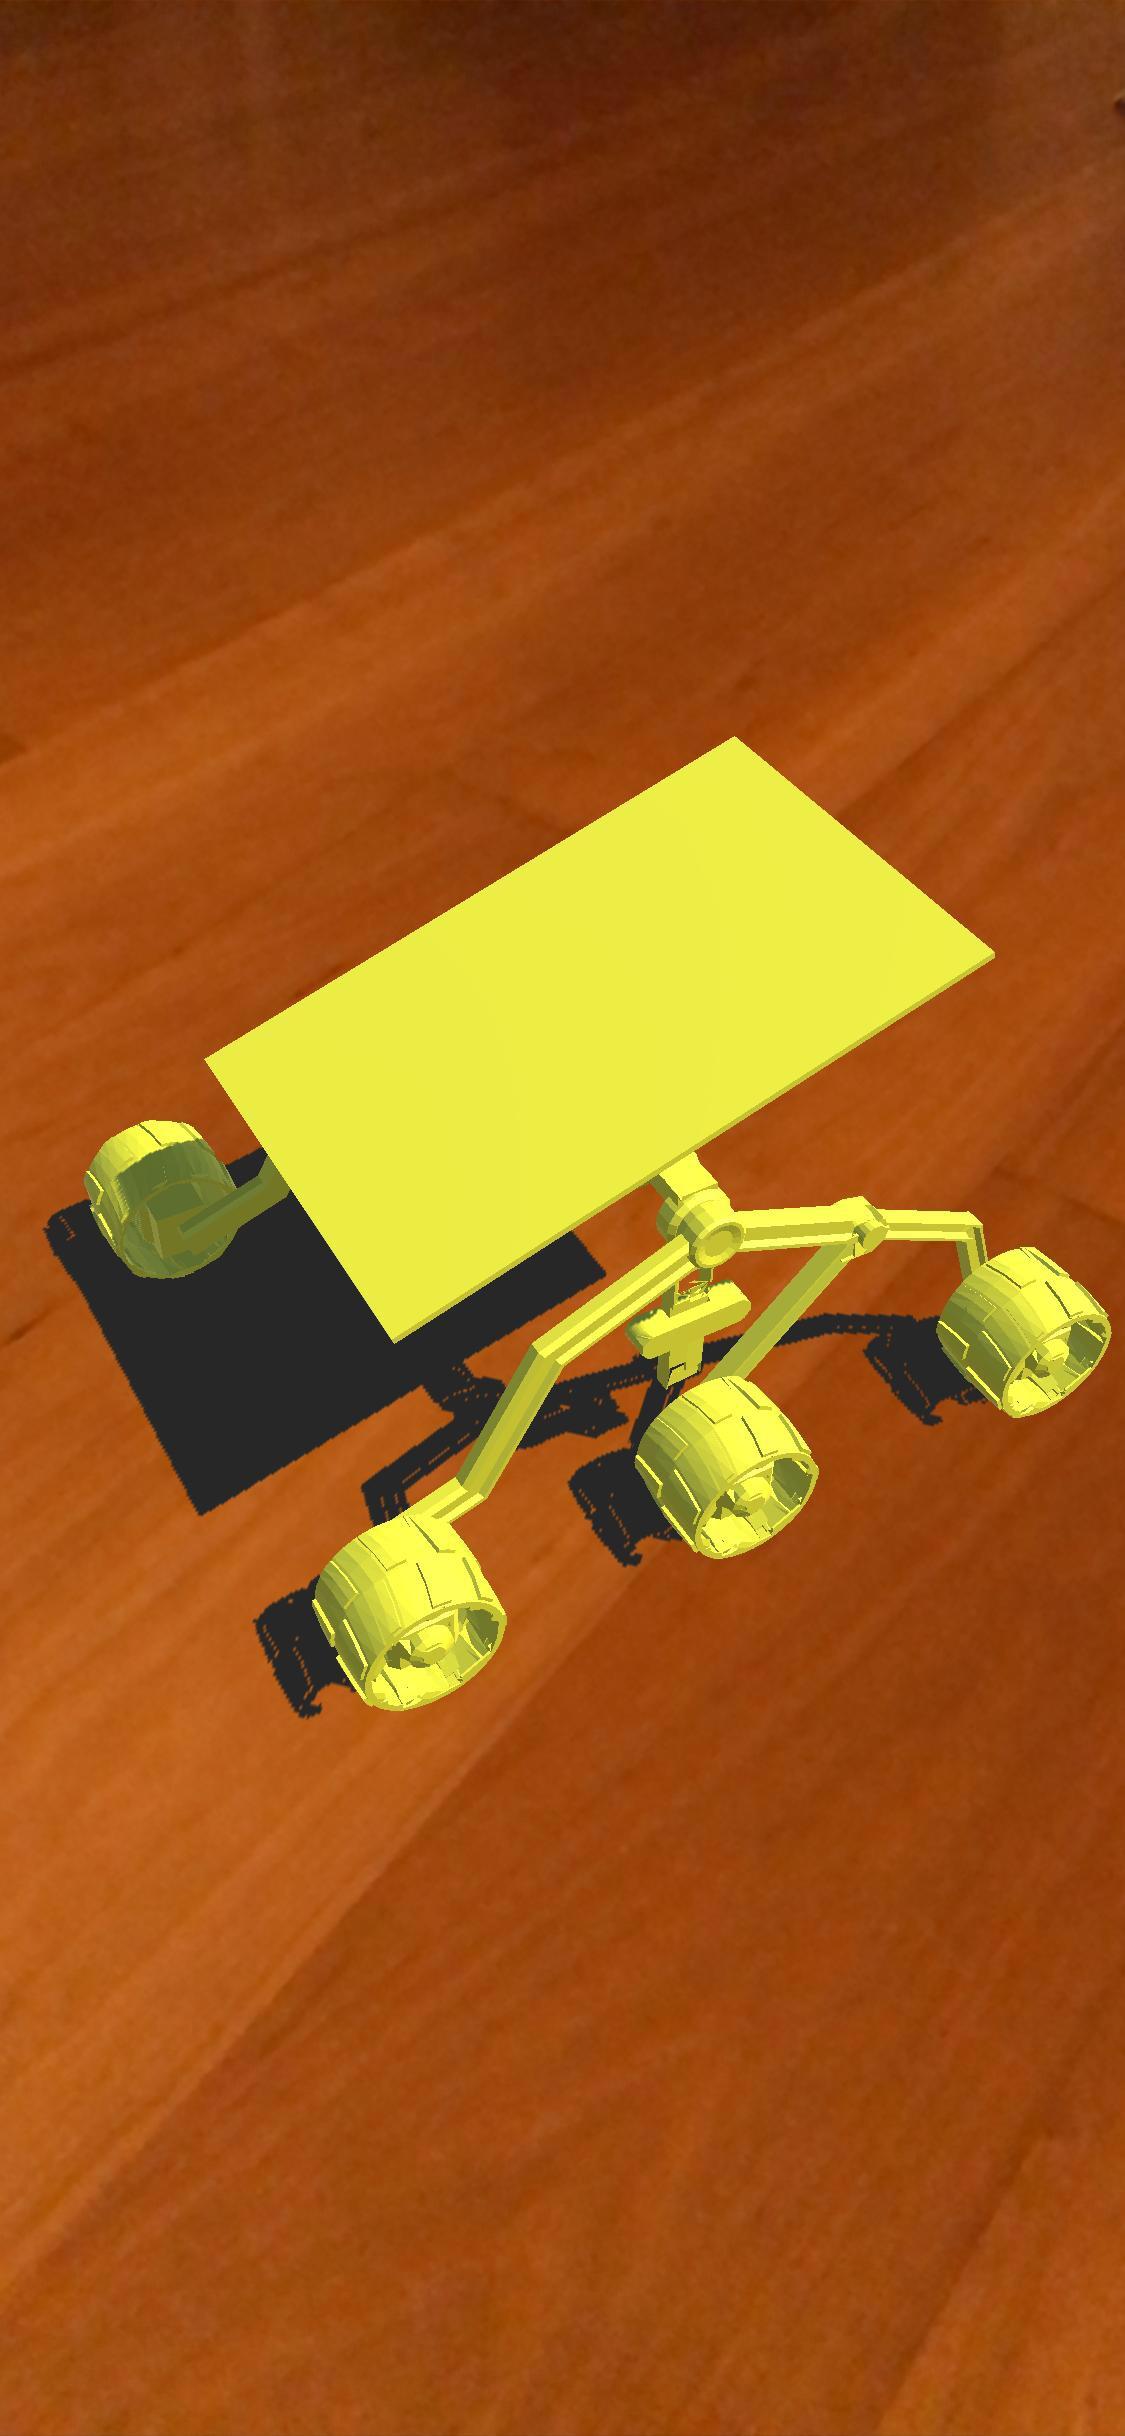 Lightbox Gallery Image 1